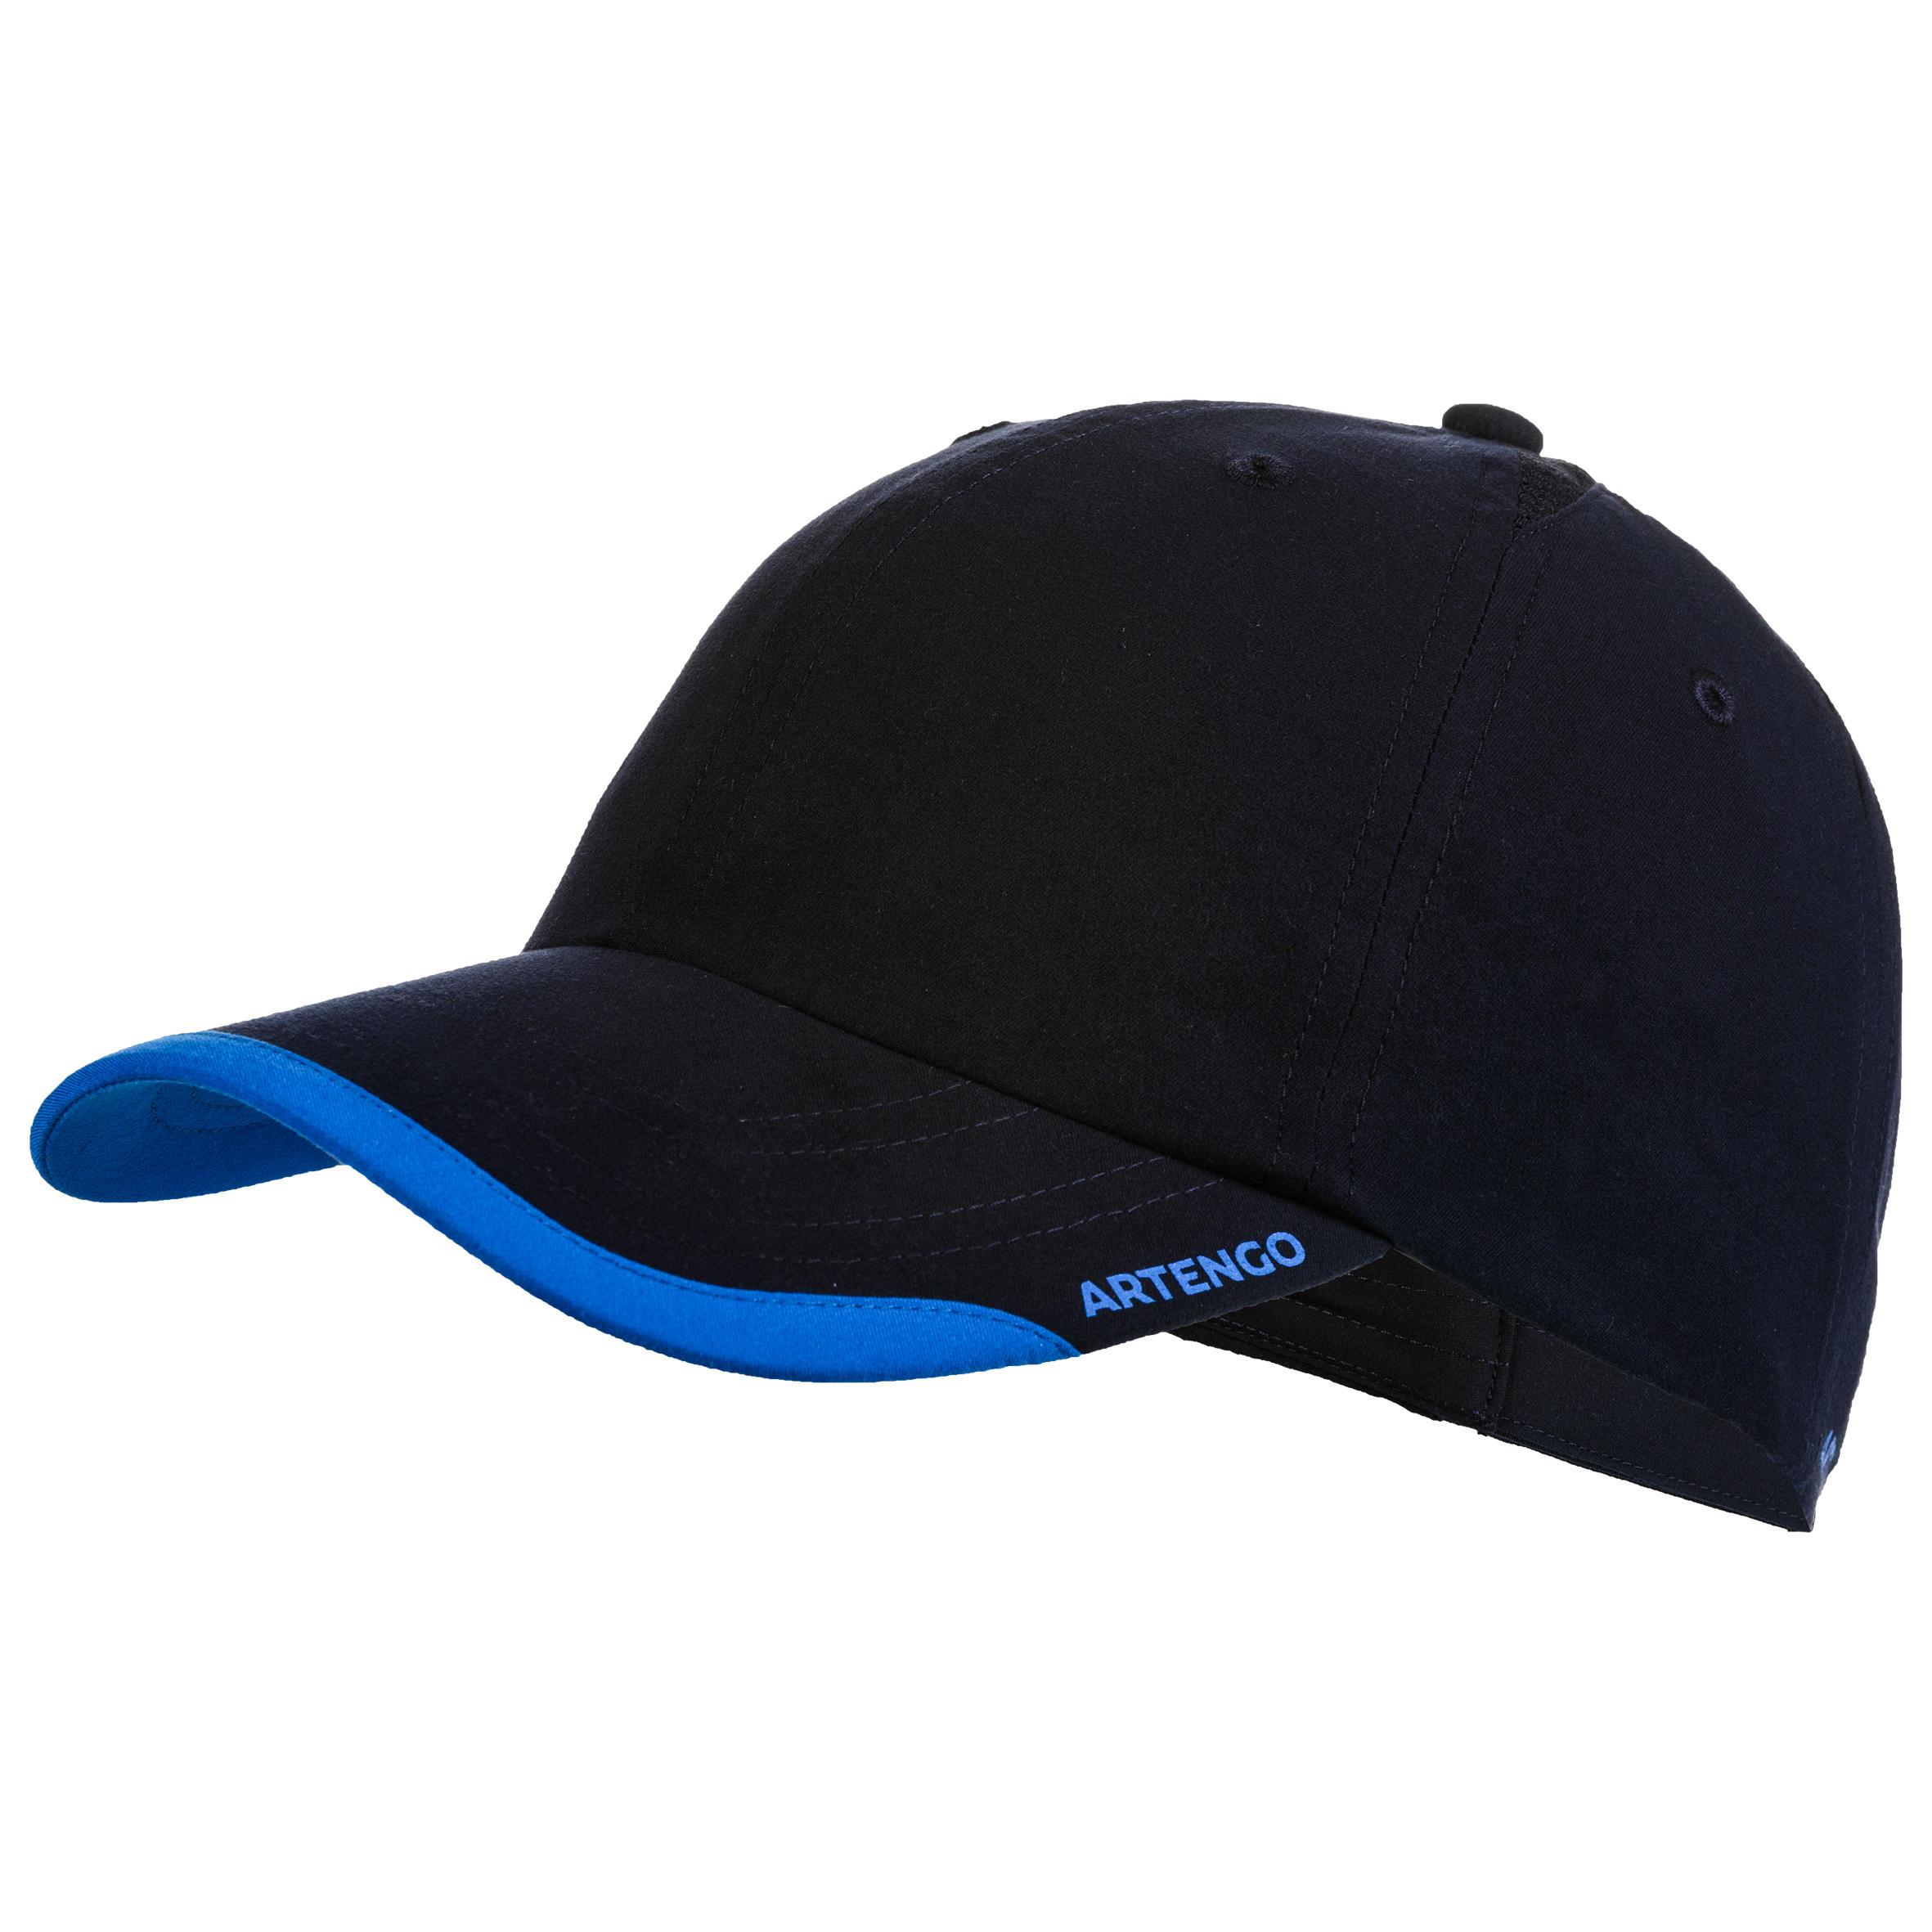 Adult Cap - Navy